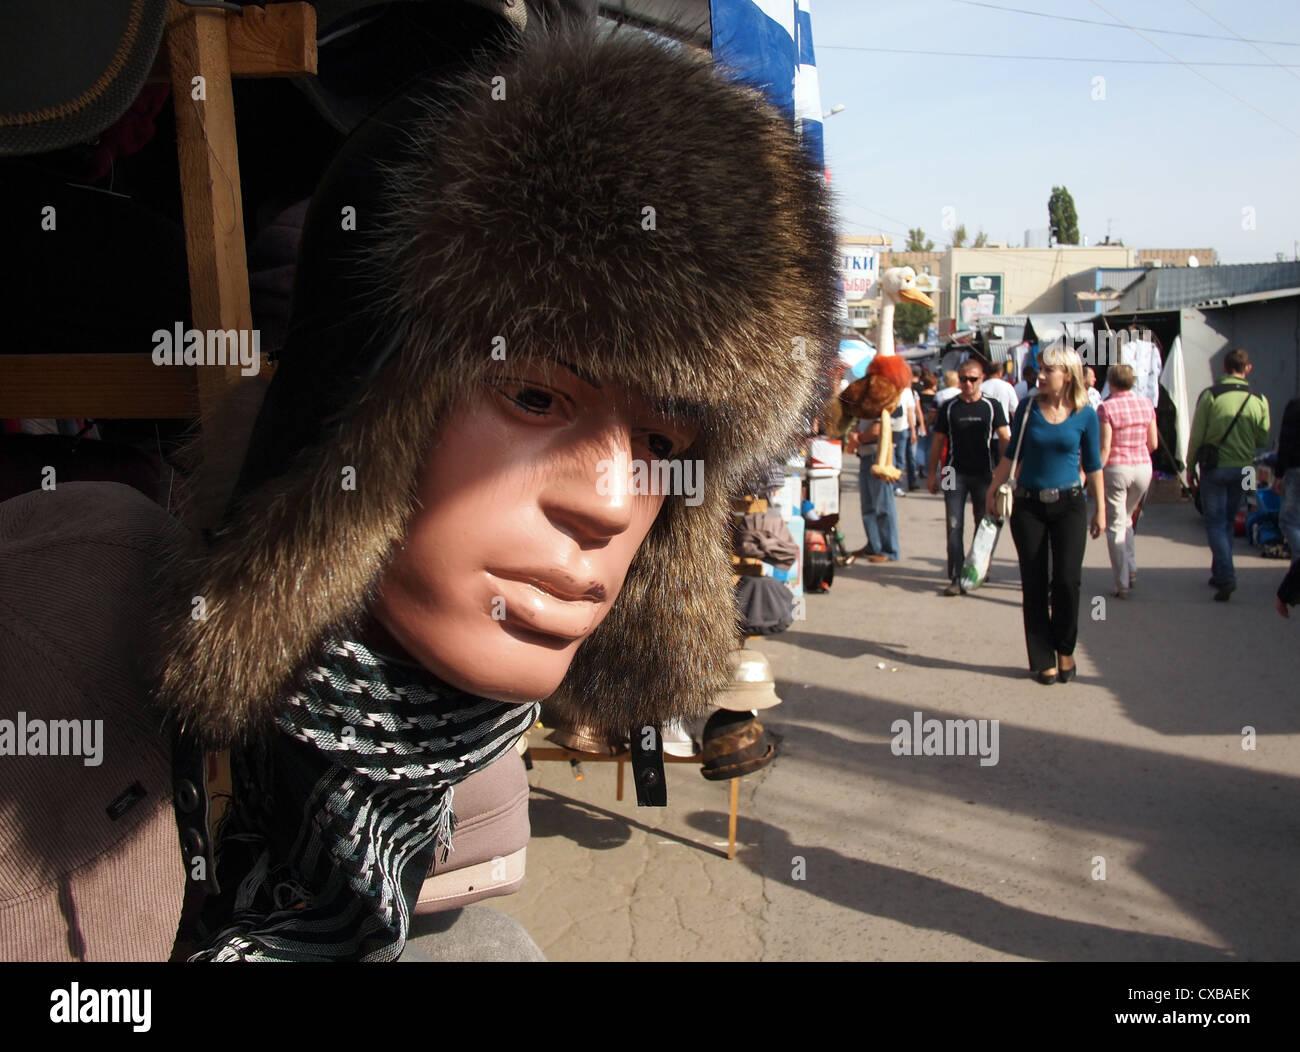 bd19ee47e2f mannequin in winter fur hat